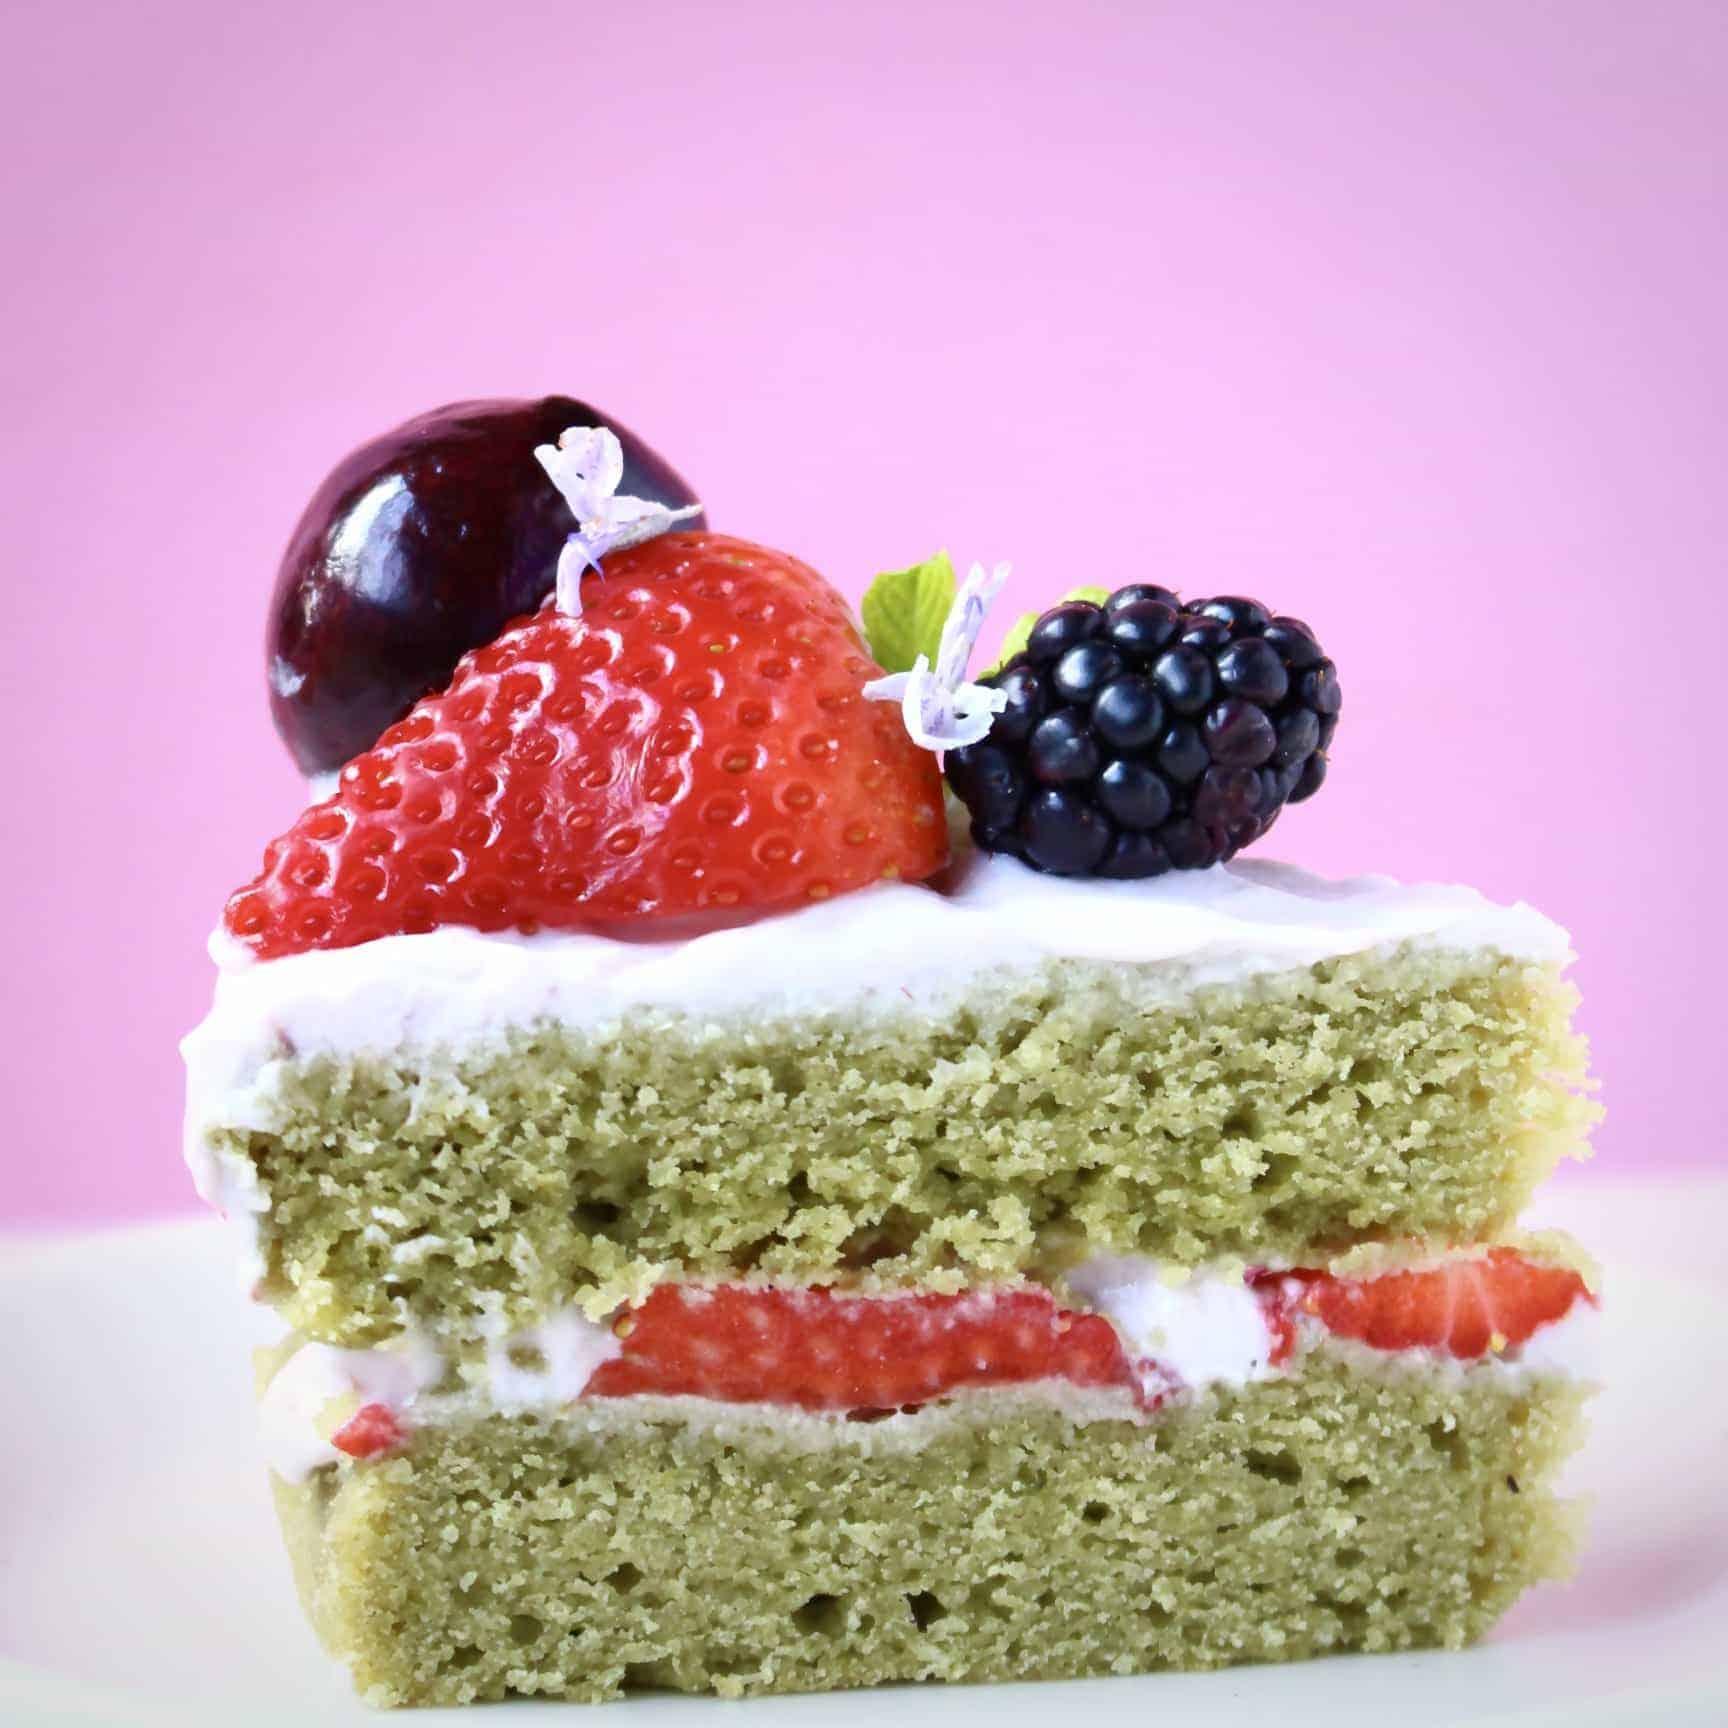 Gluten-Free Vegan Matcha Strawberry Sponge Cake